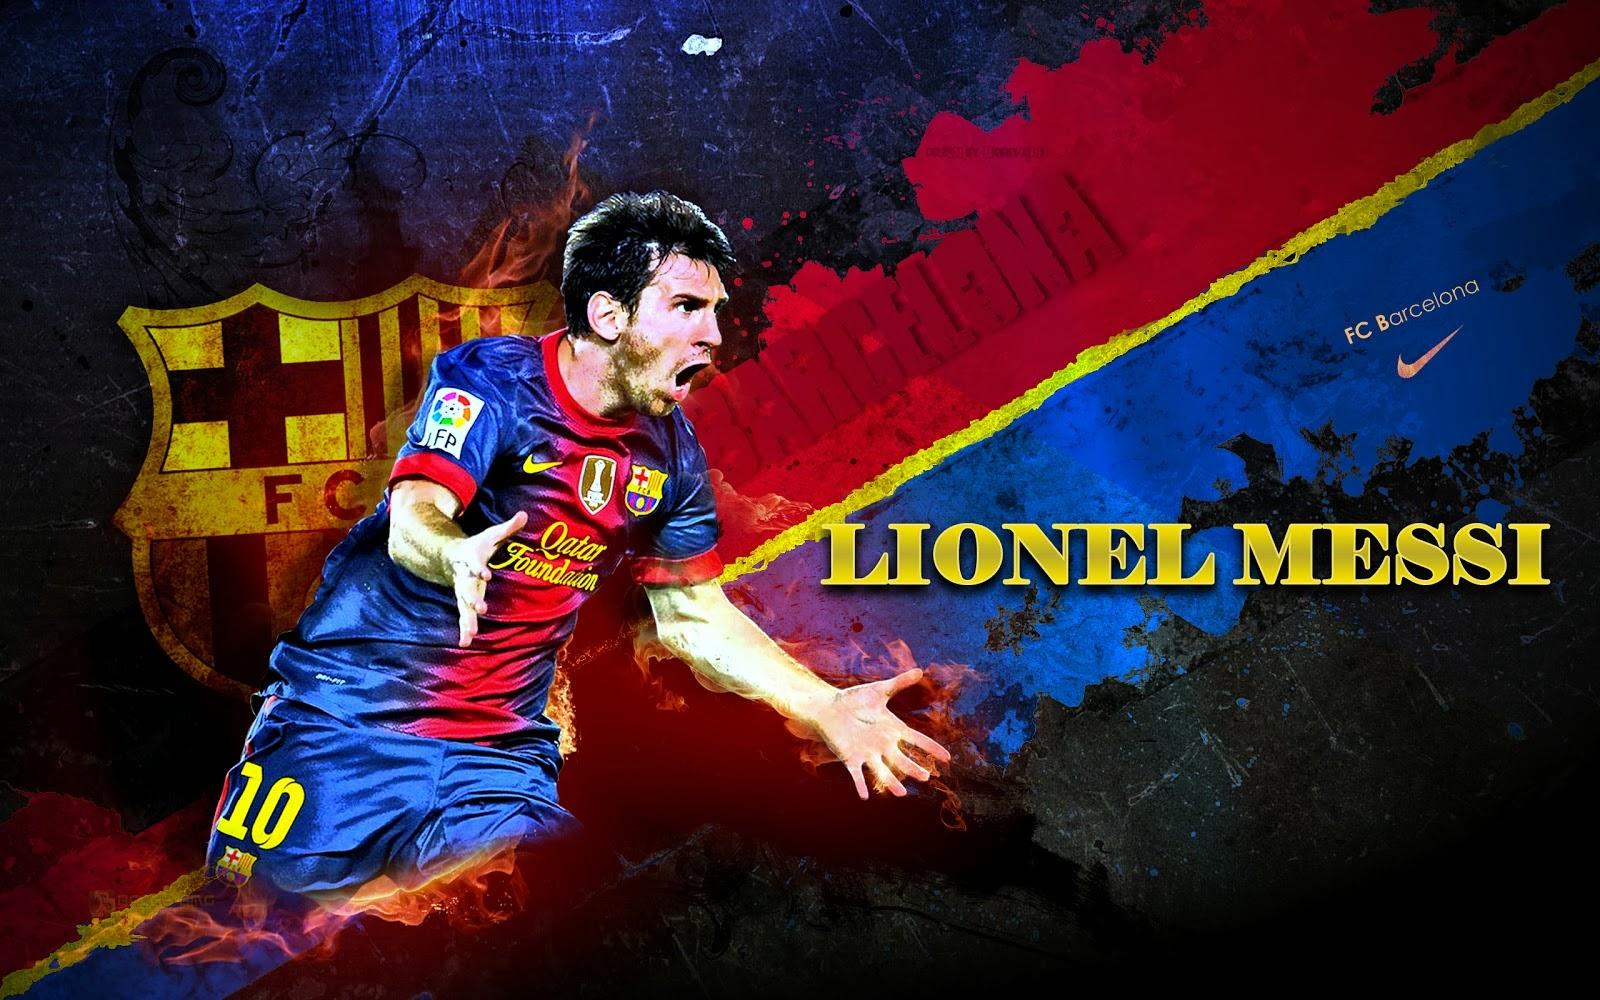 Lionel Messi Barcelona New Hd Wallpaper 2013 2014